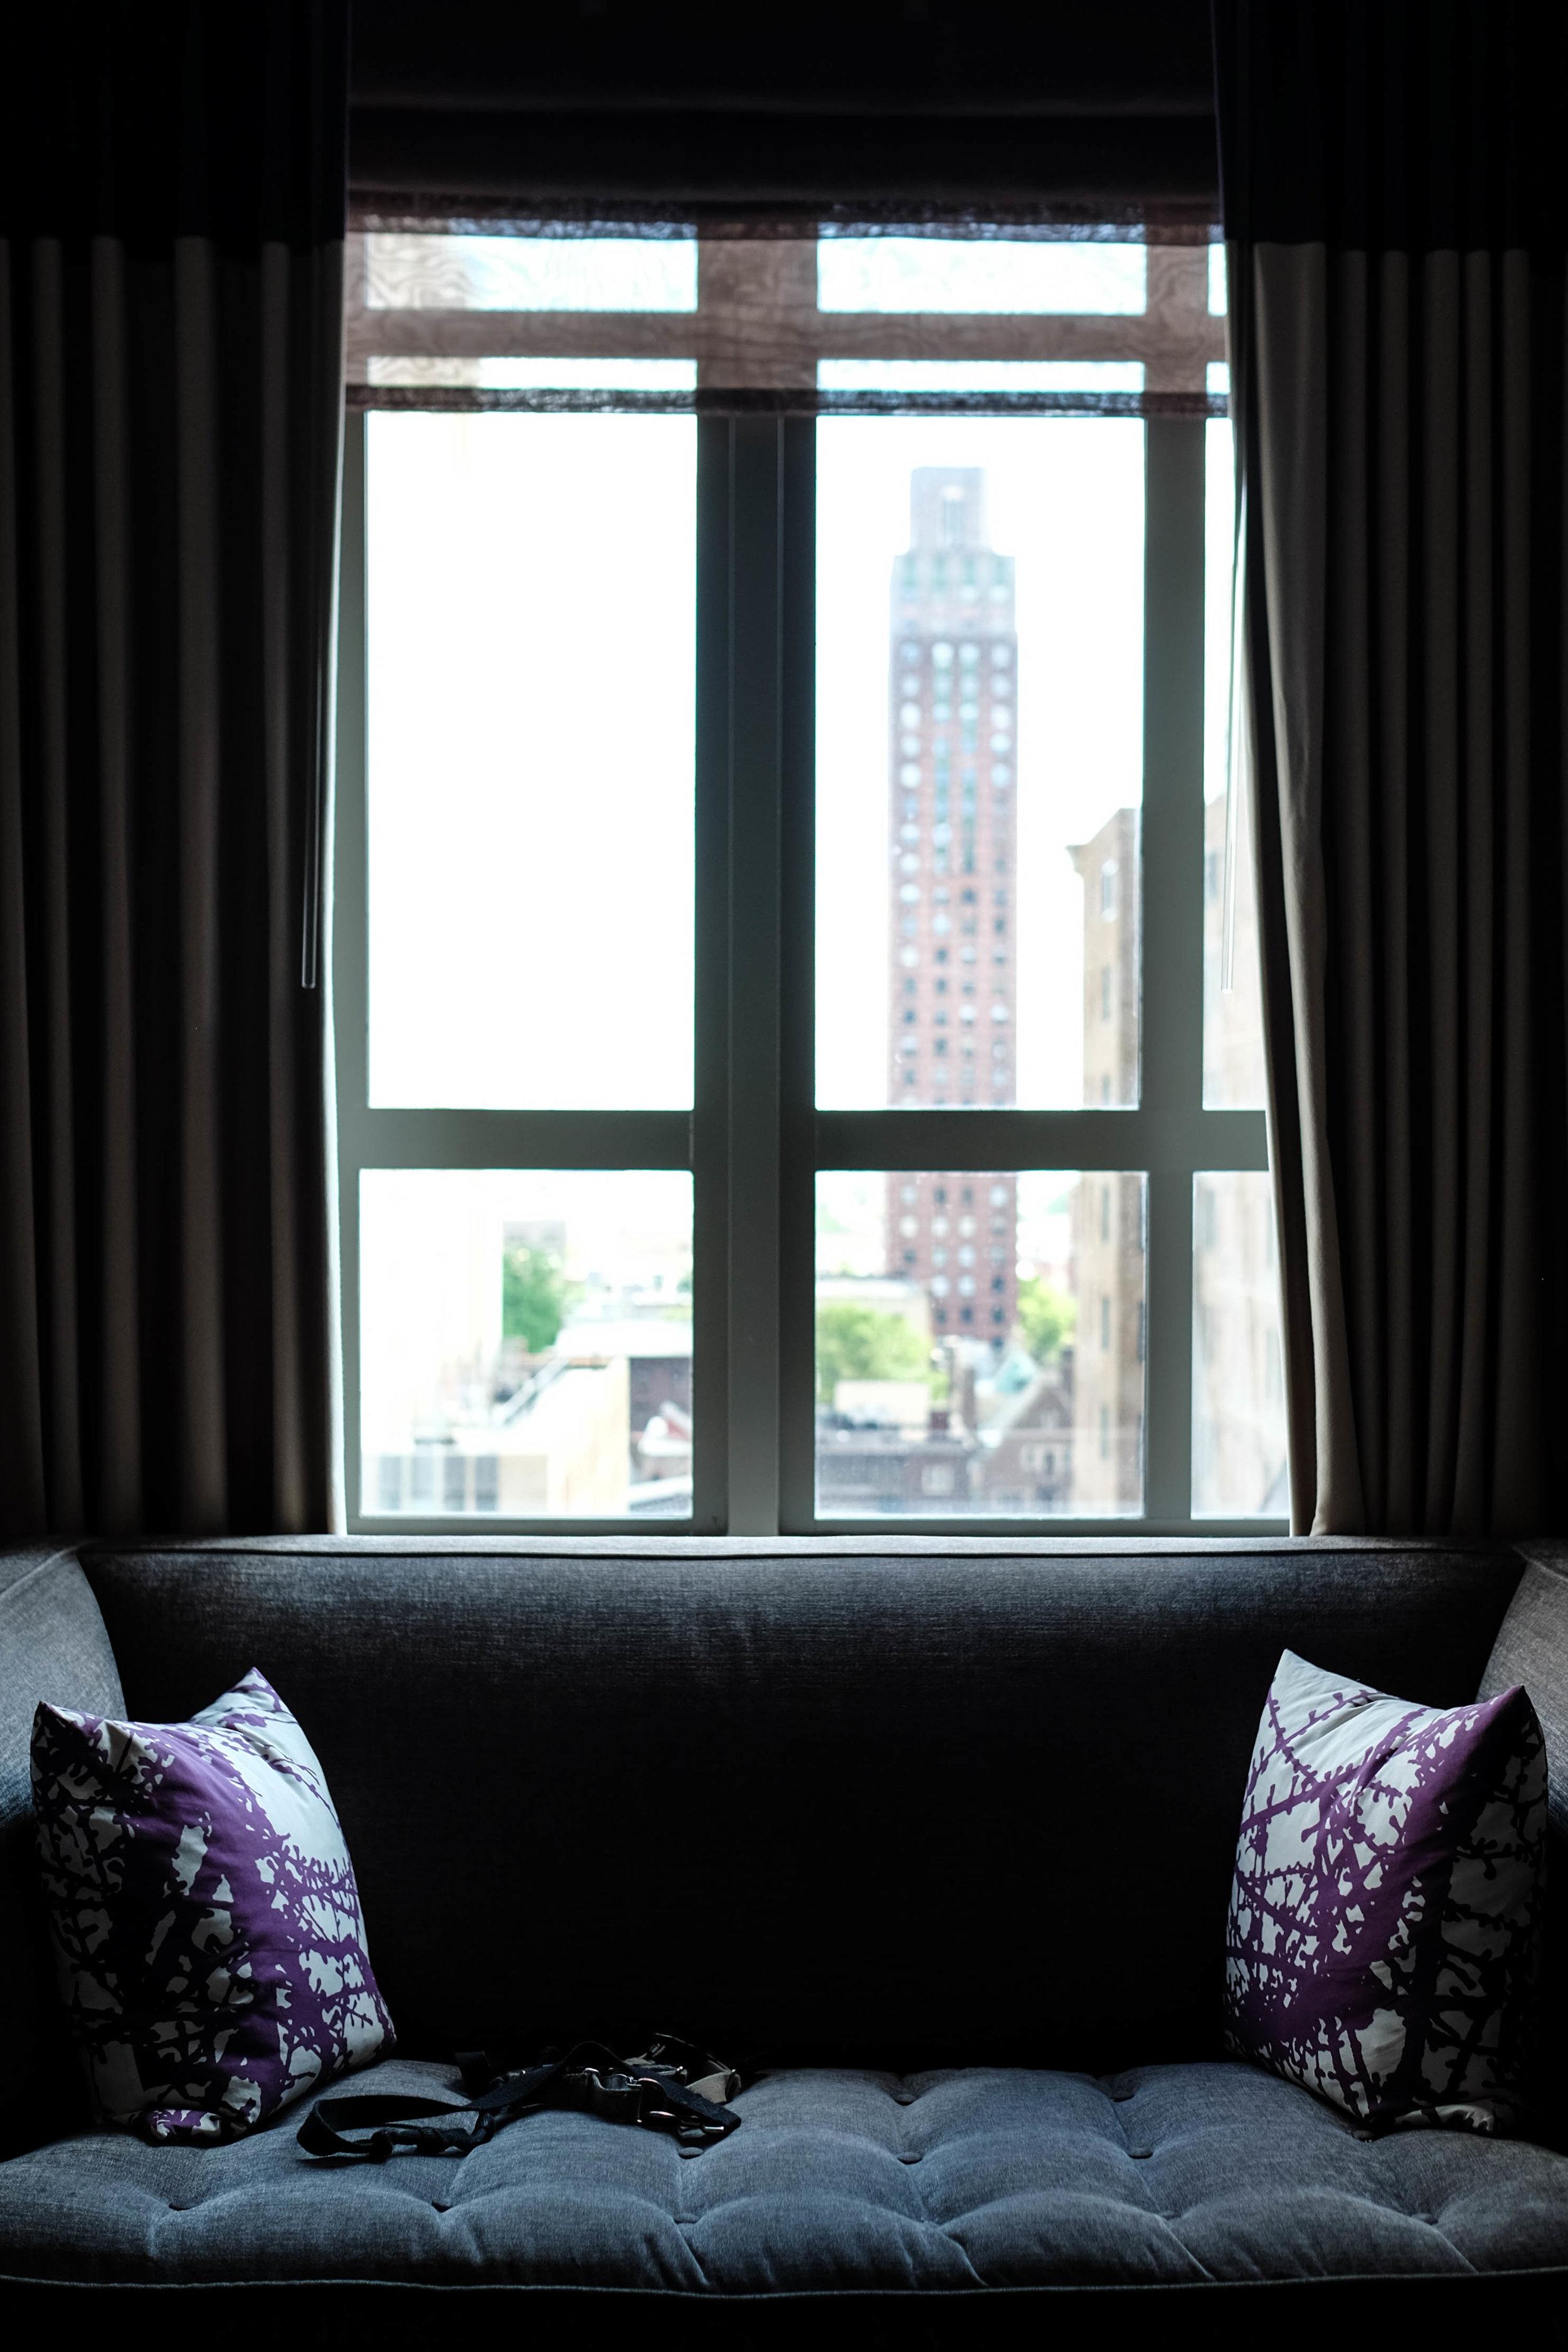 Kimpton_Hotel_Philadelphia_Dog_Friendly_Photographer_Kristen_Humbert-7675.jpg